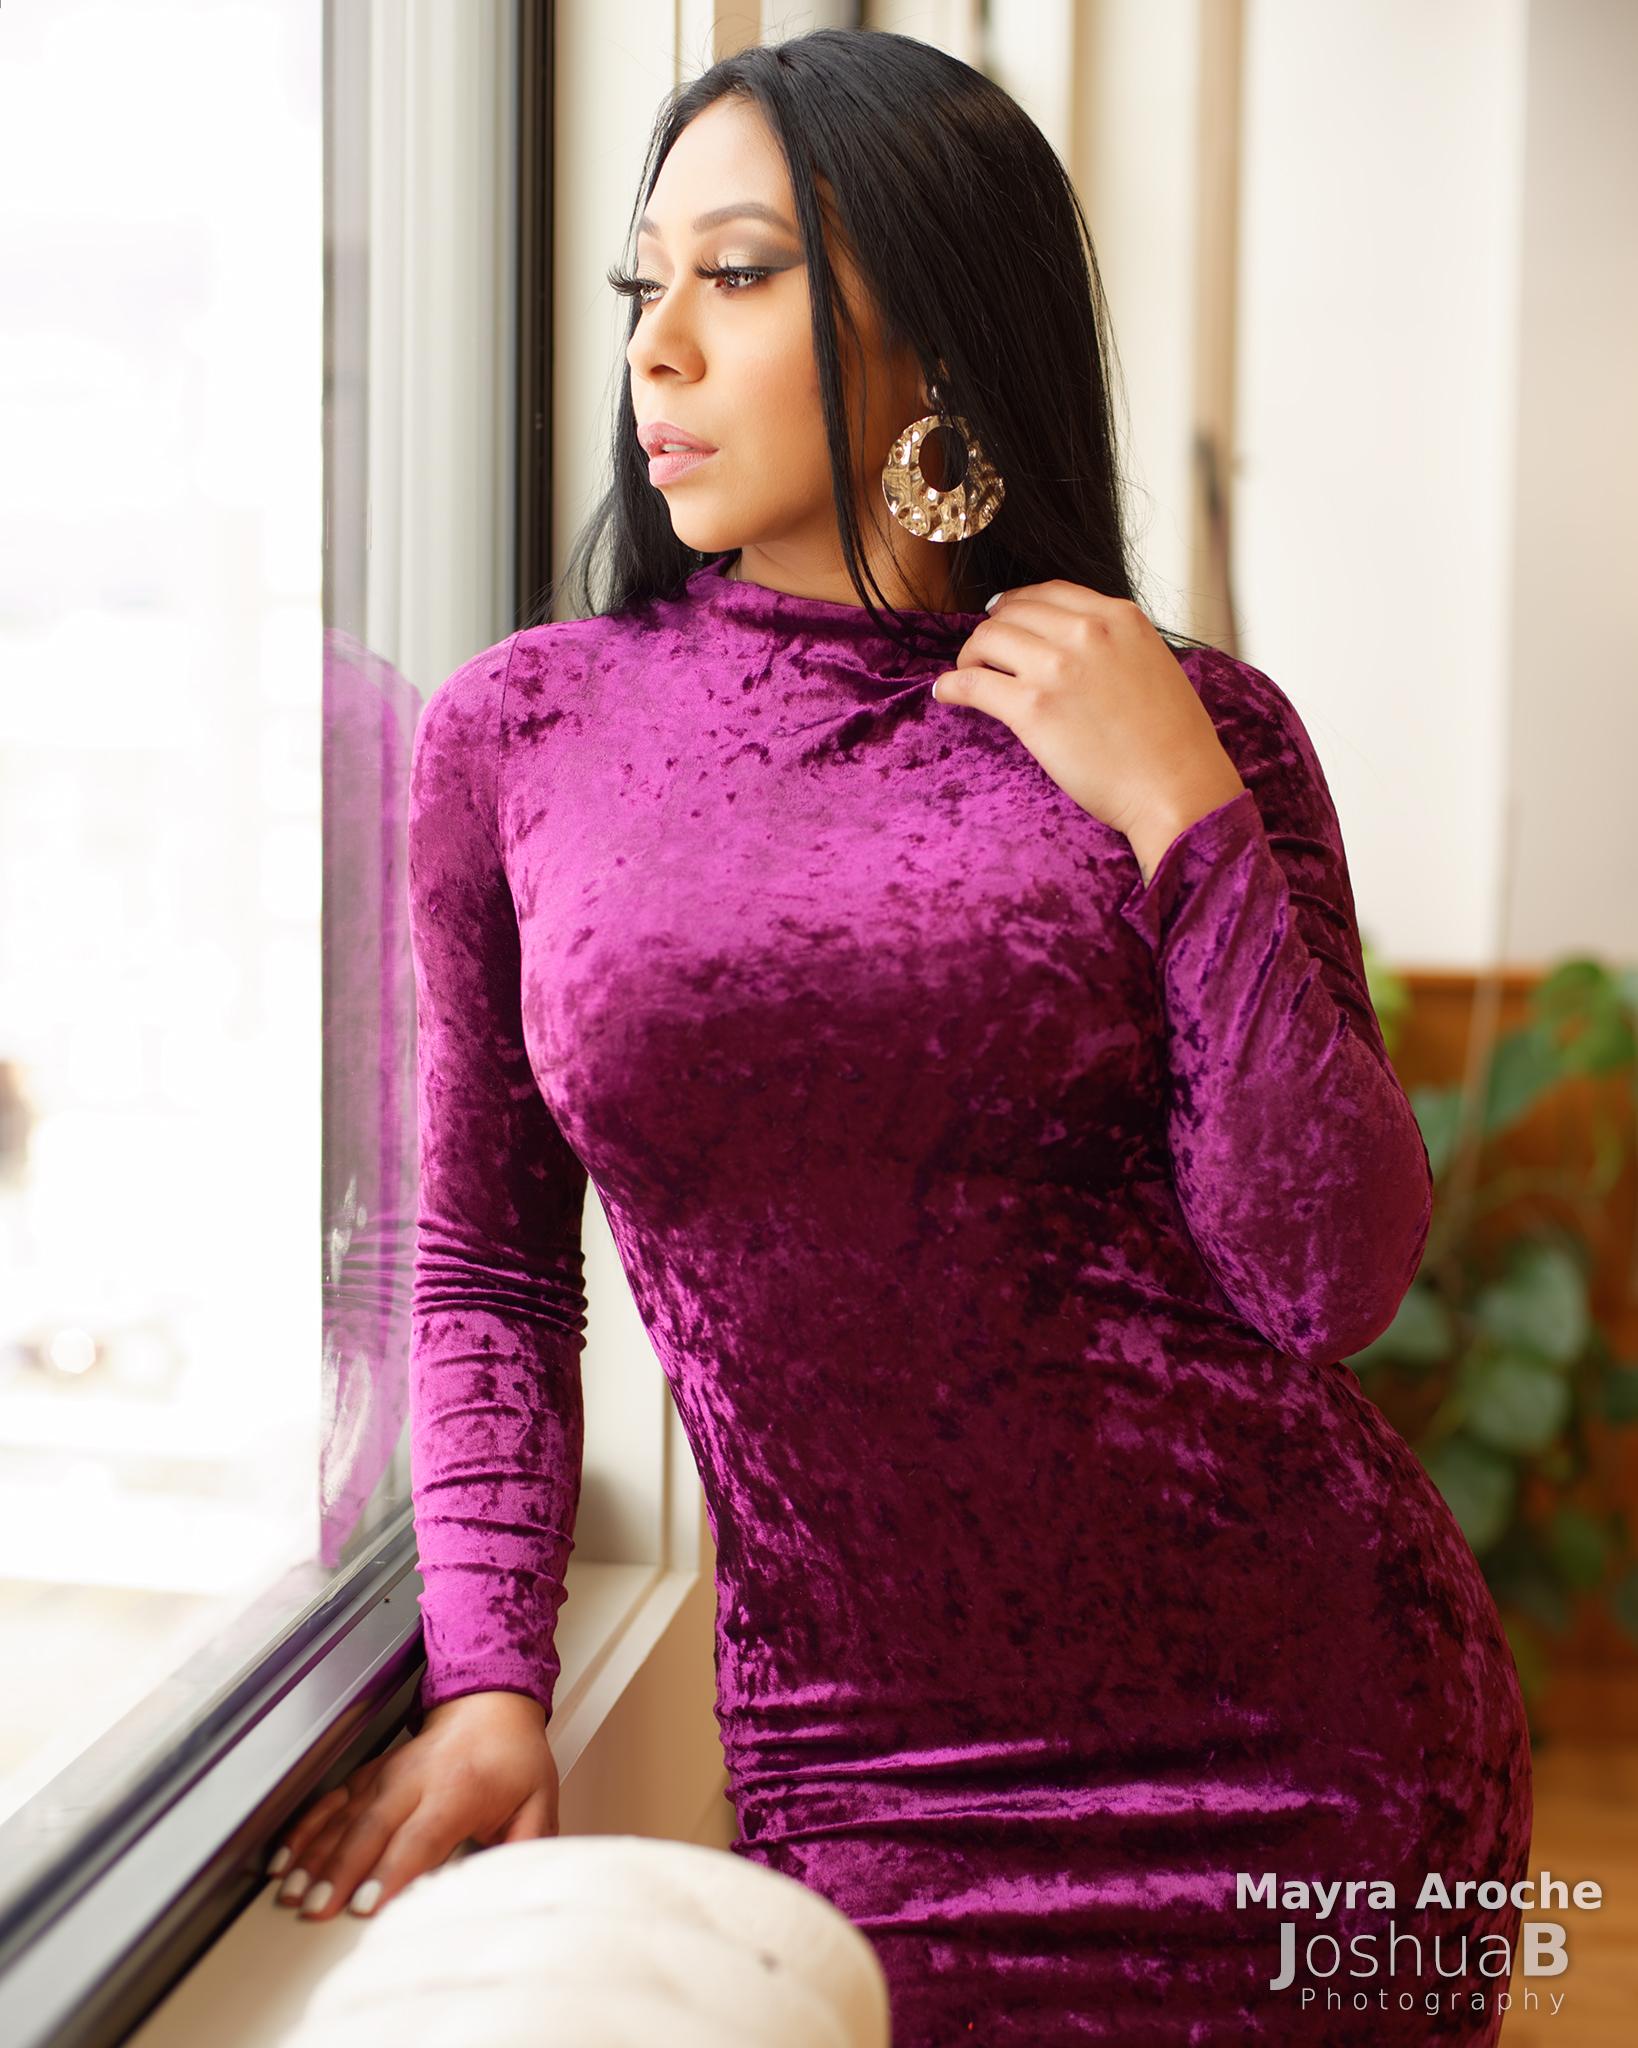 Mayra Aroche modeling at window in purple dress